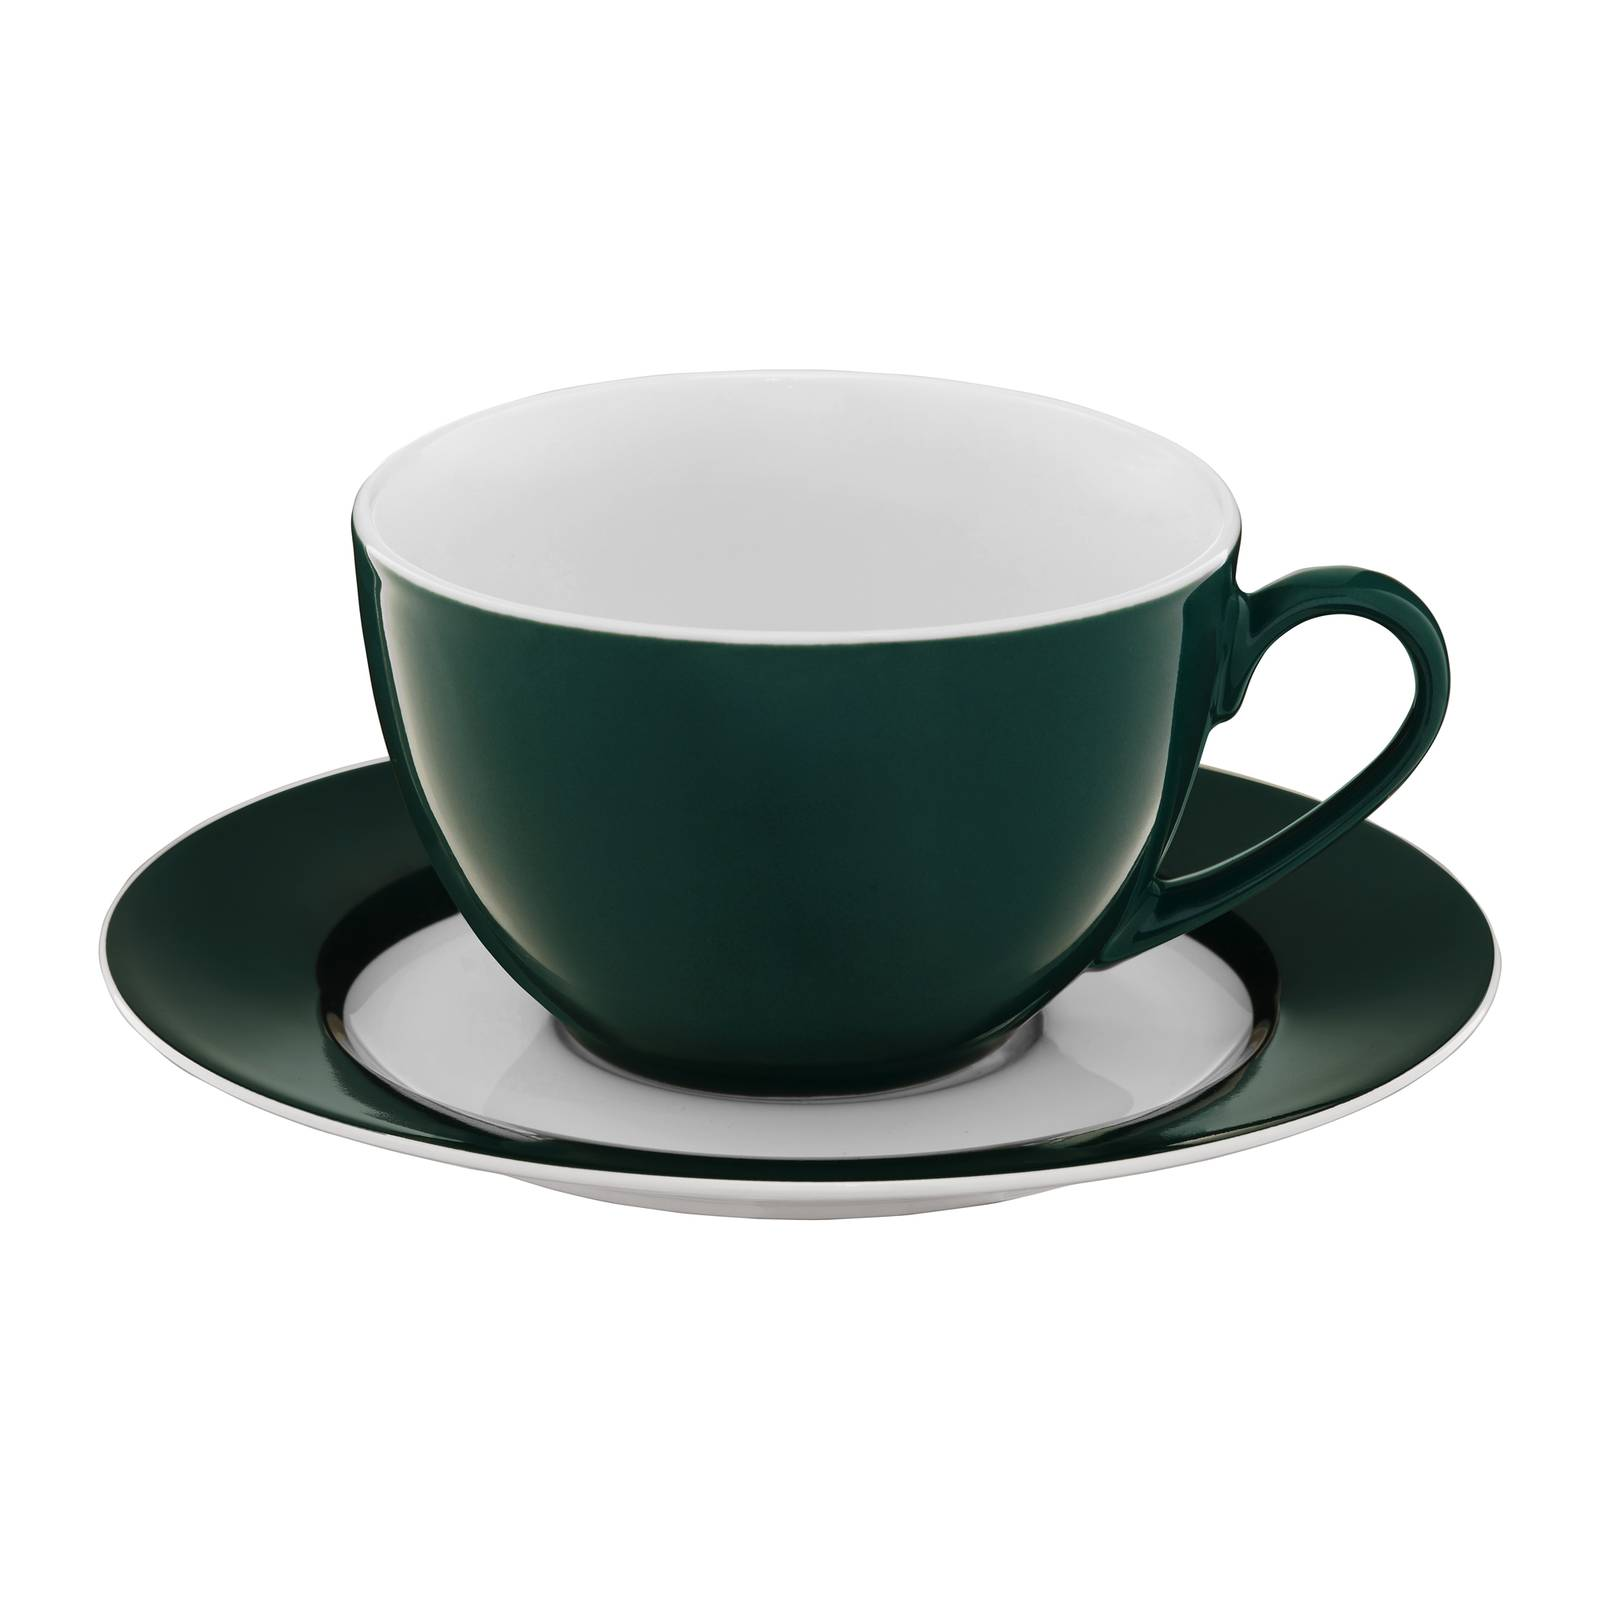 Kaffeeservice Aura Green 12 Tlg. AMBITION